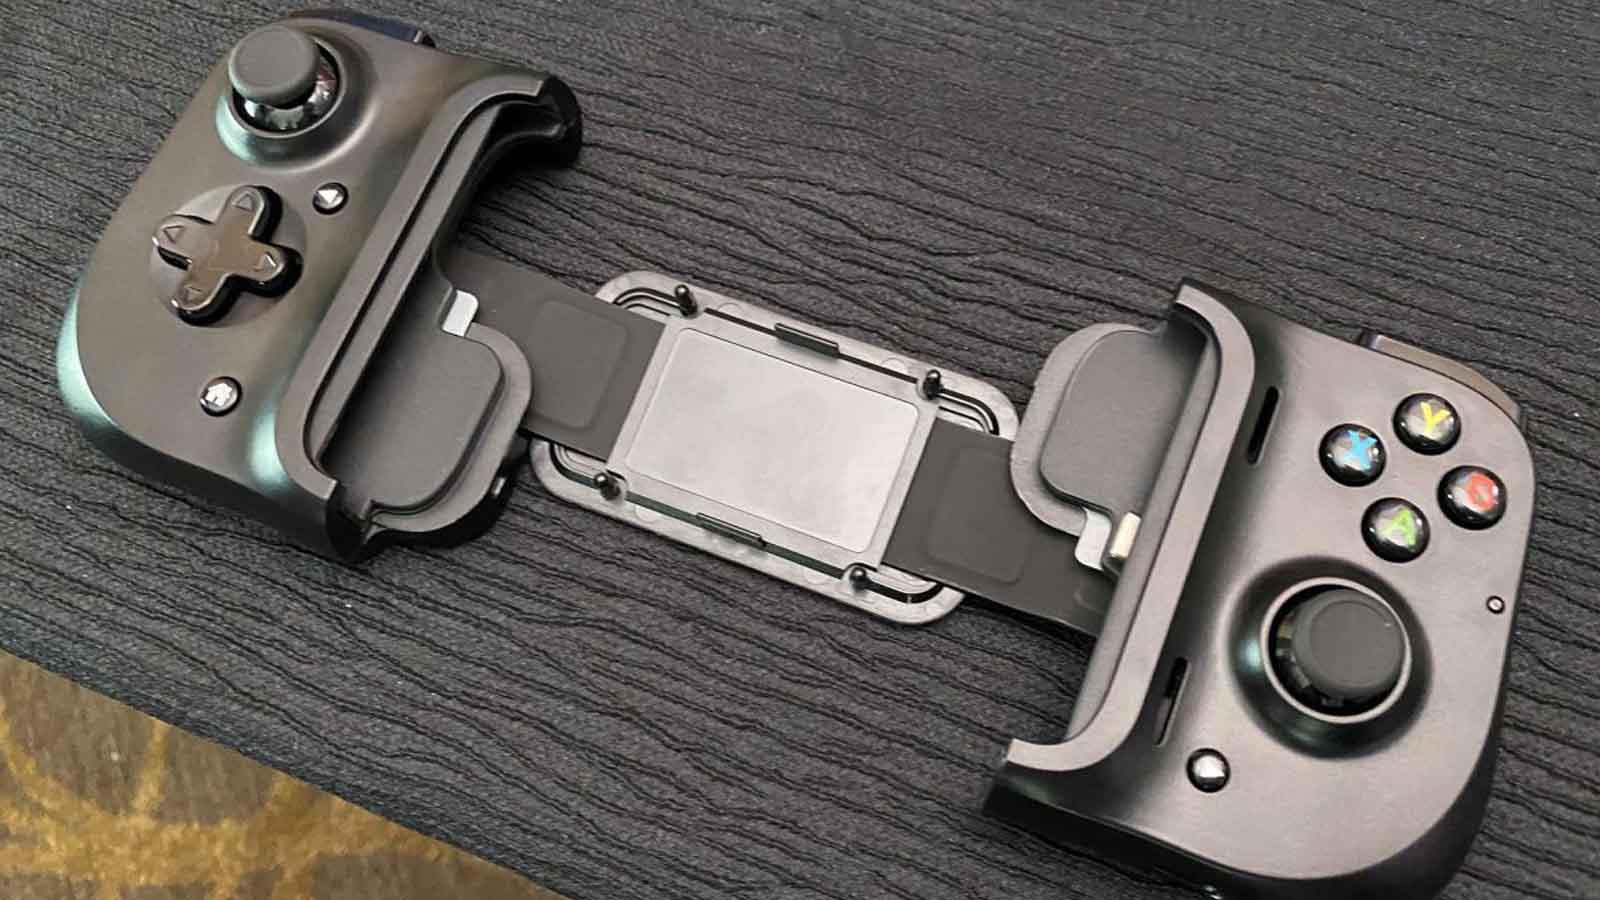 razer kishi controller for phones